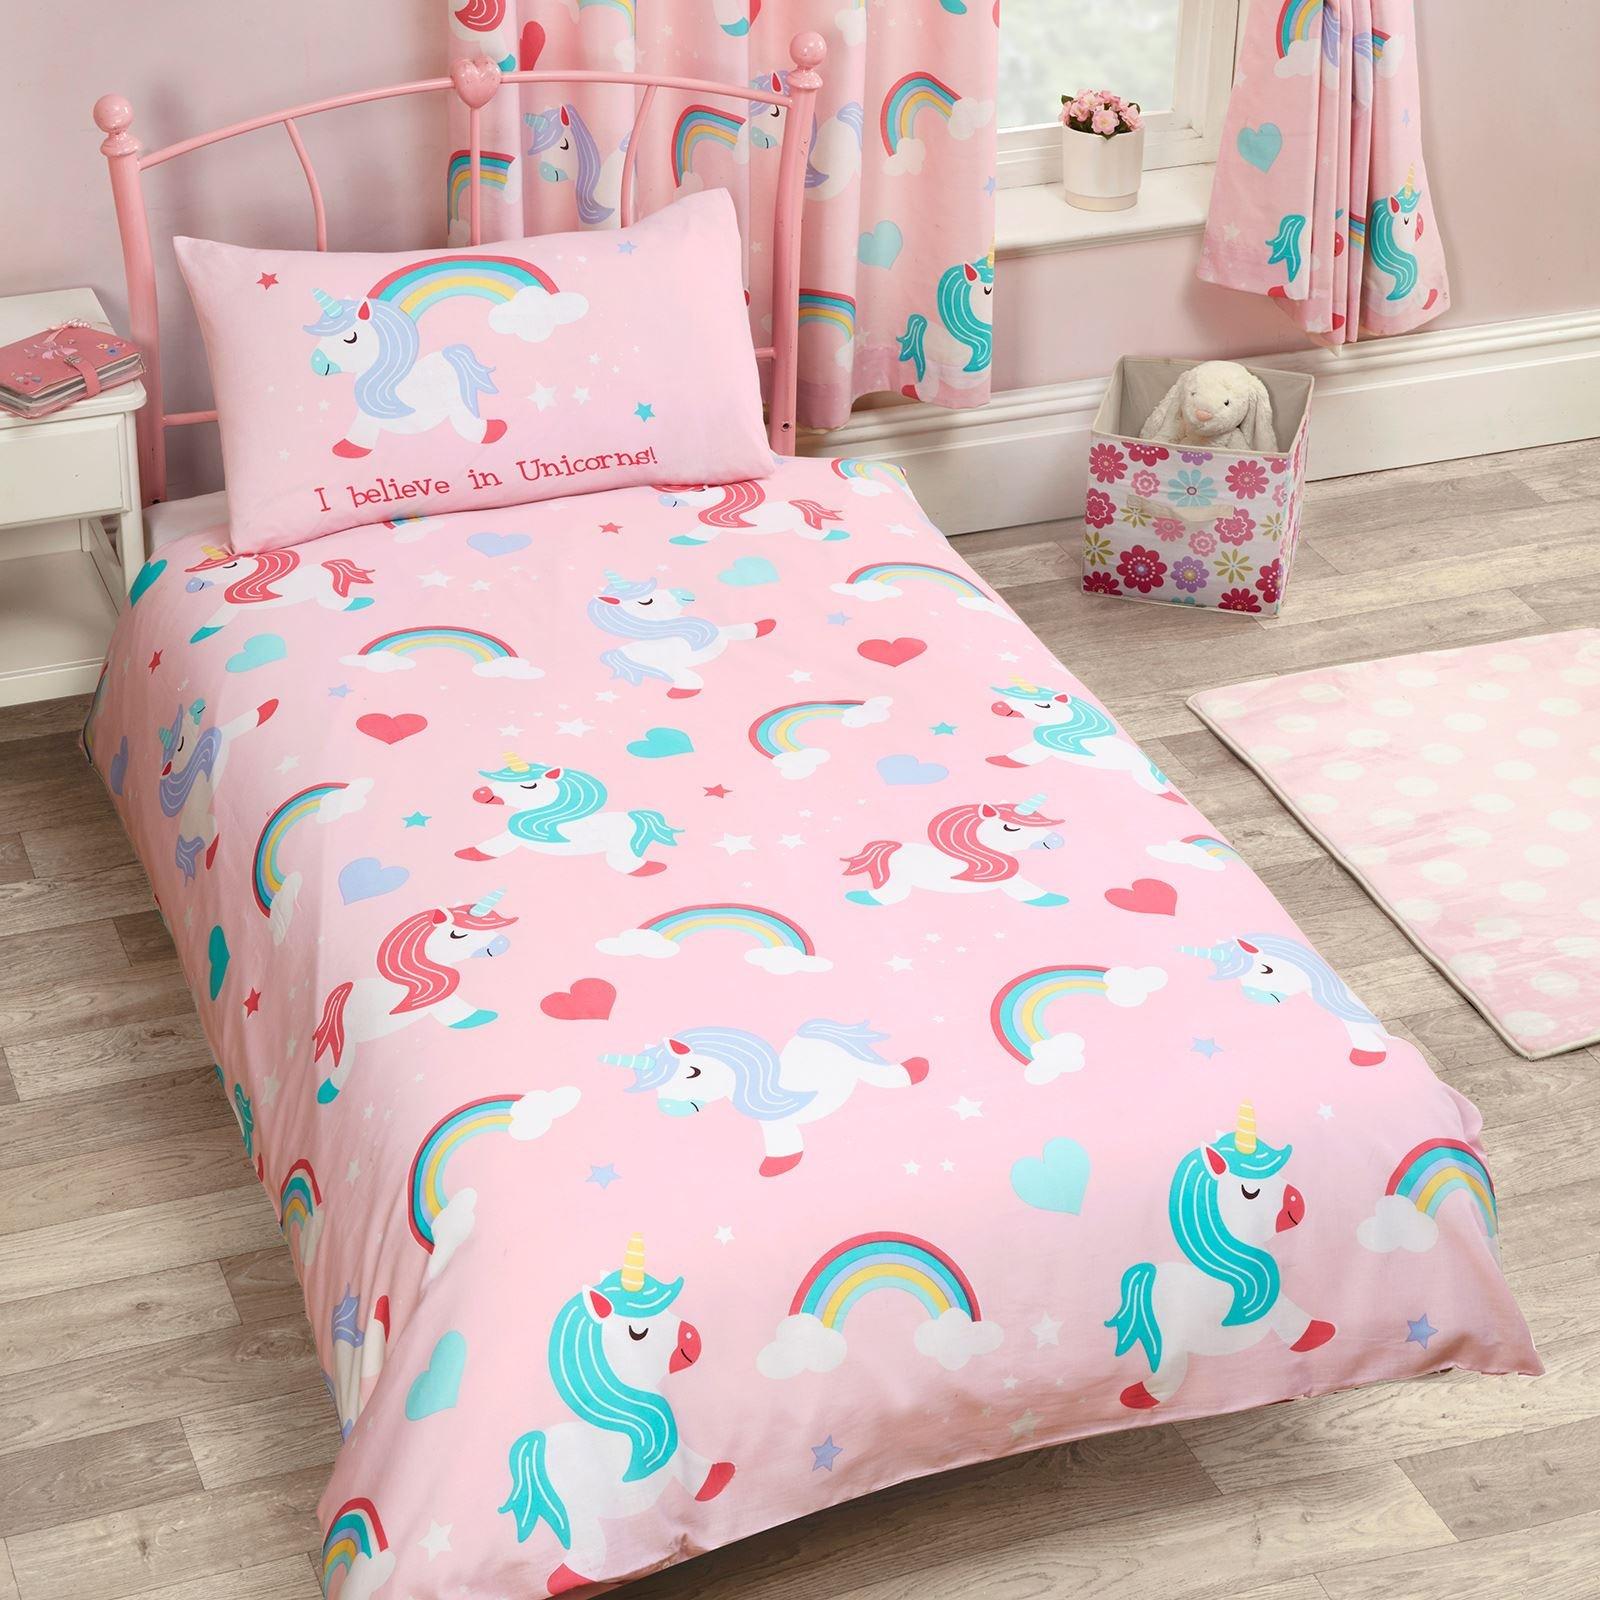 I Believe in Unicorns 2 Piece UK Single/US Twin Sheet Set, 1 x Double Sided Sheet 1 x Pillowcase